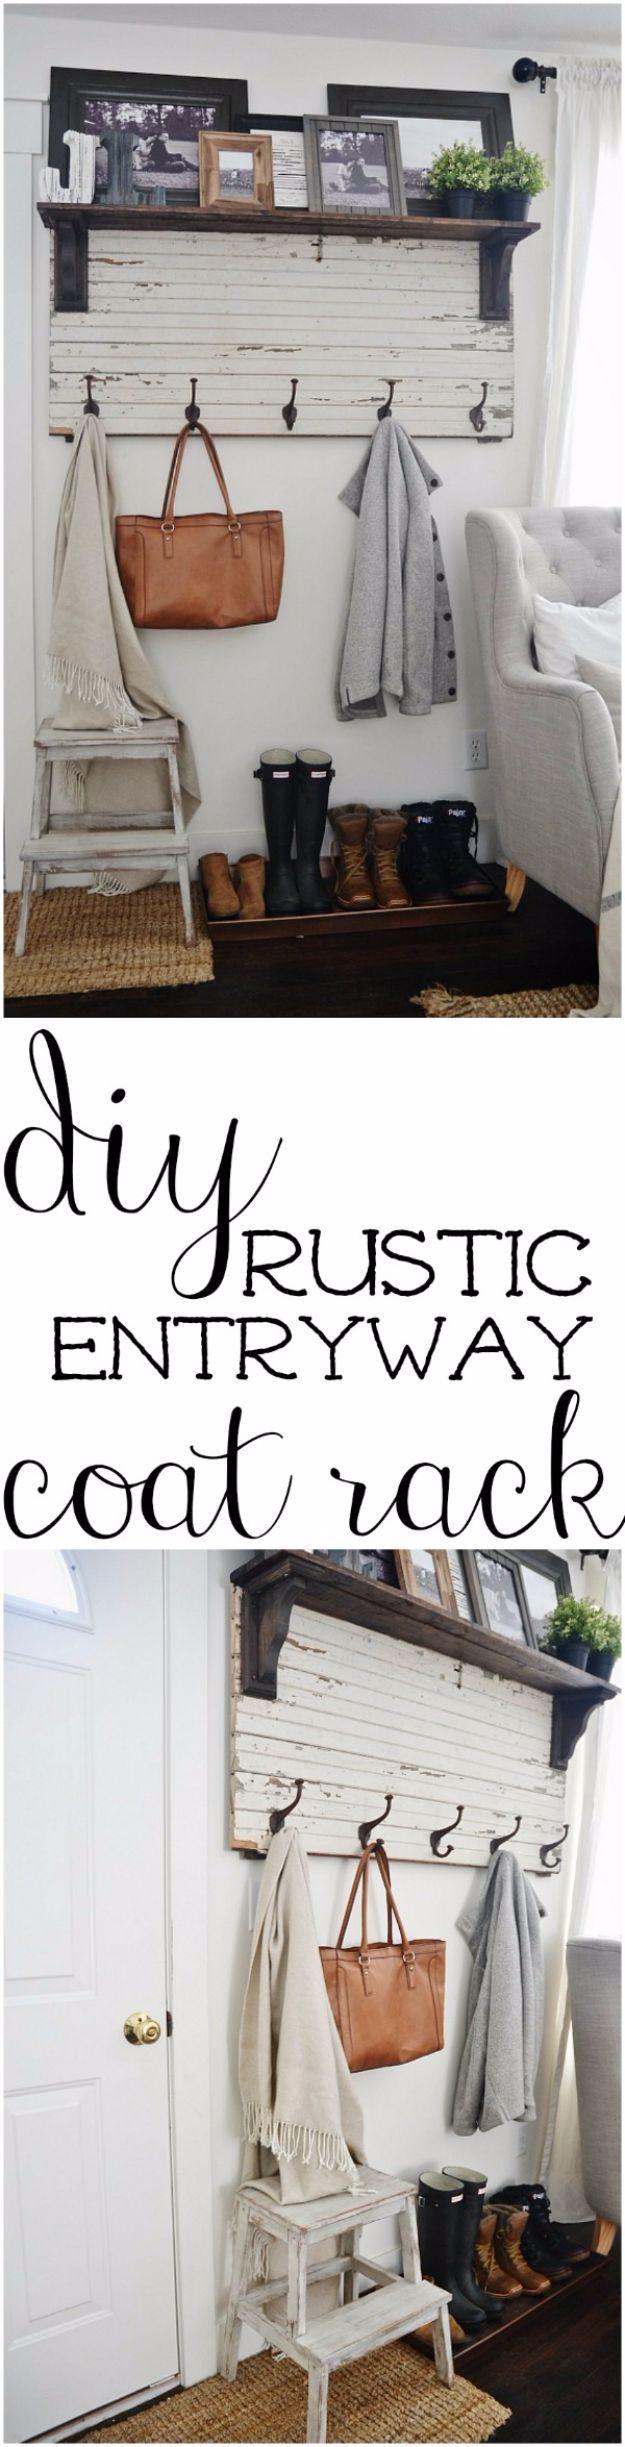 Best country decor ideas diy rustic entryway coat rack rustic